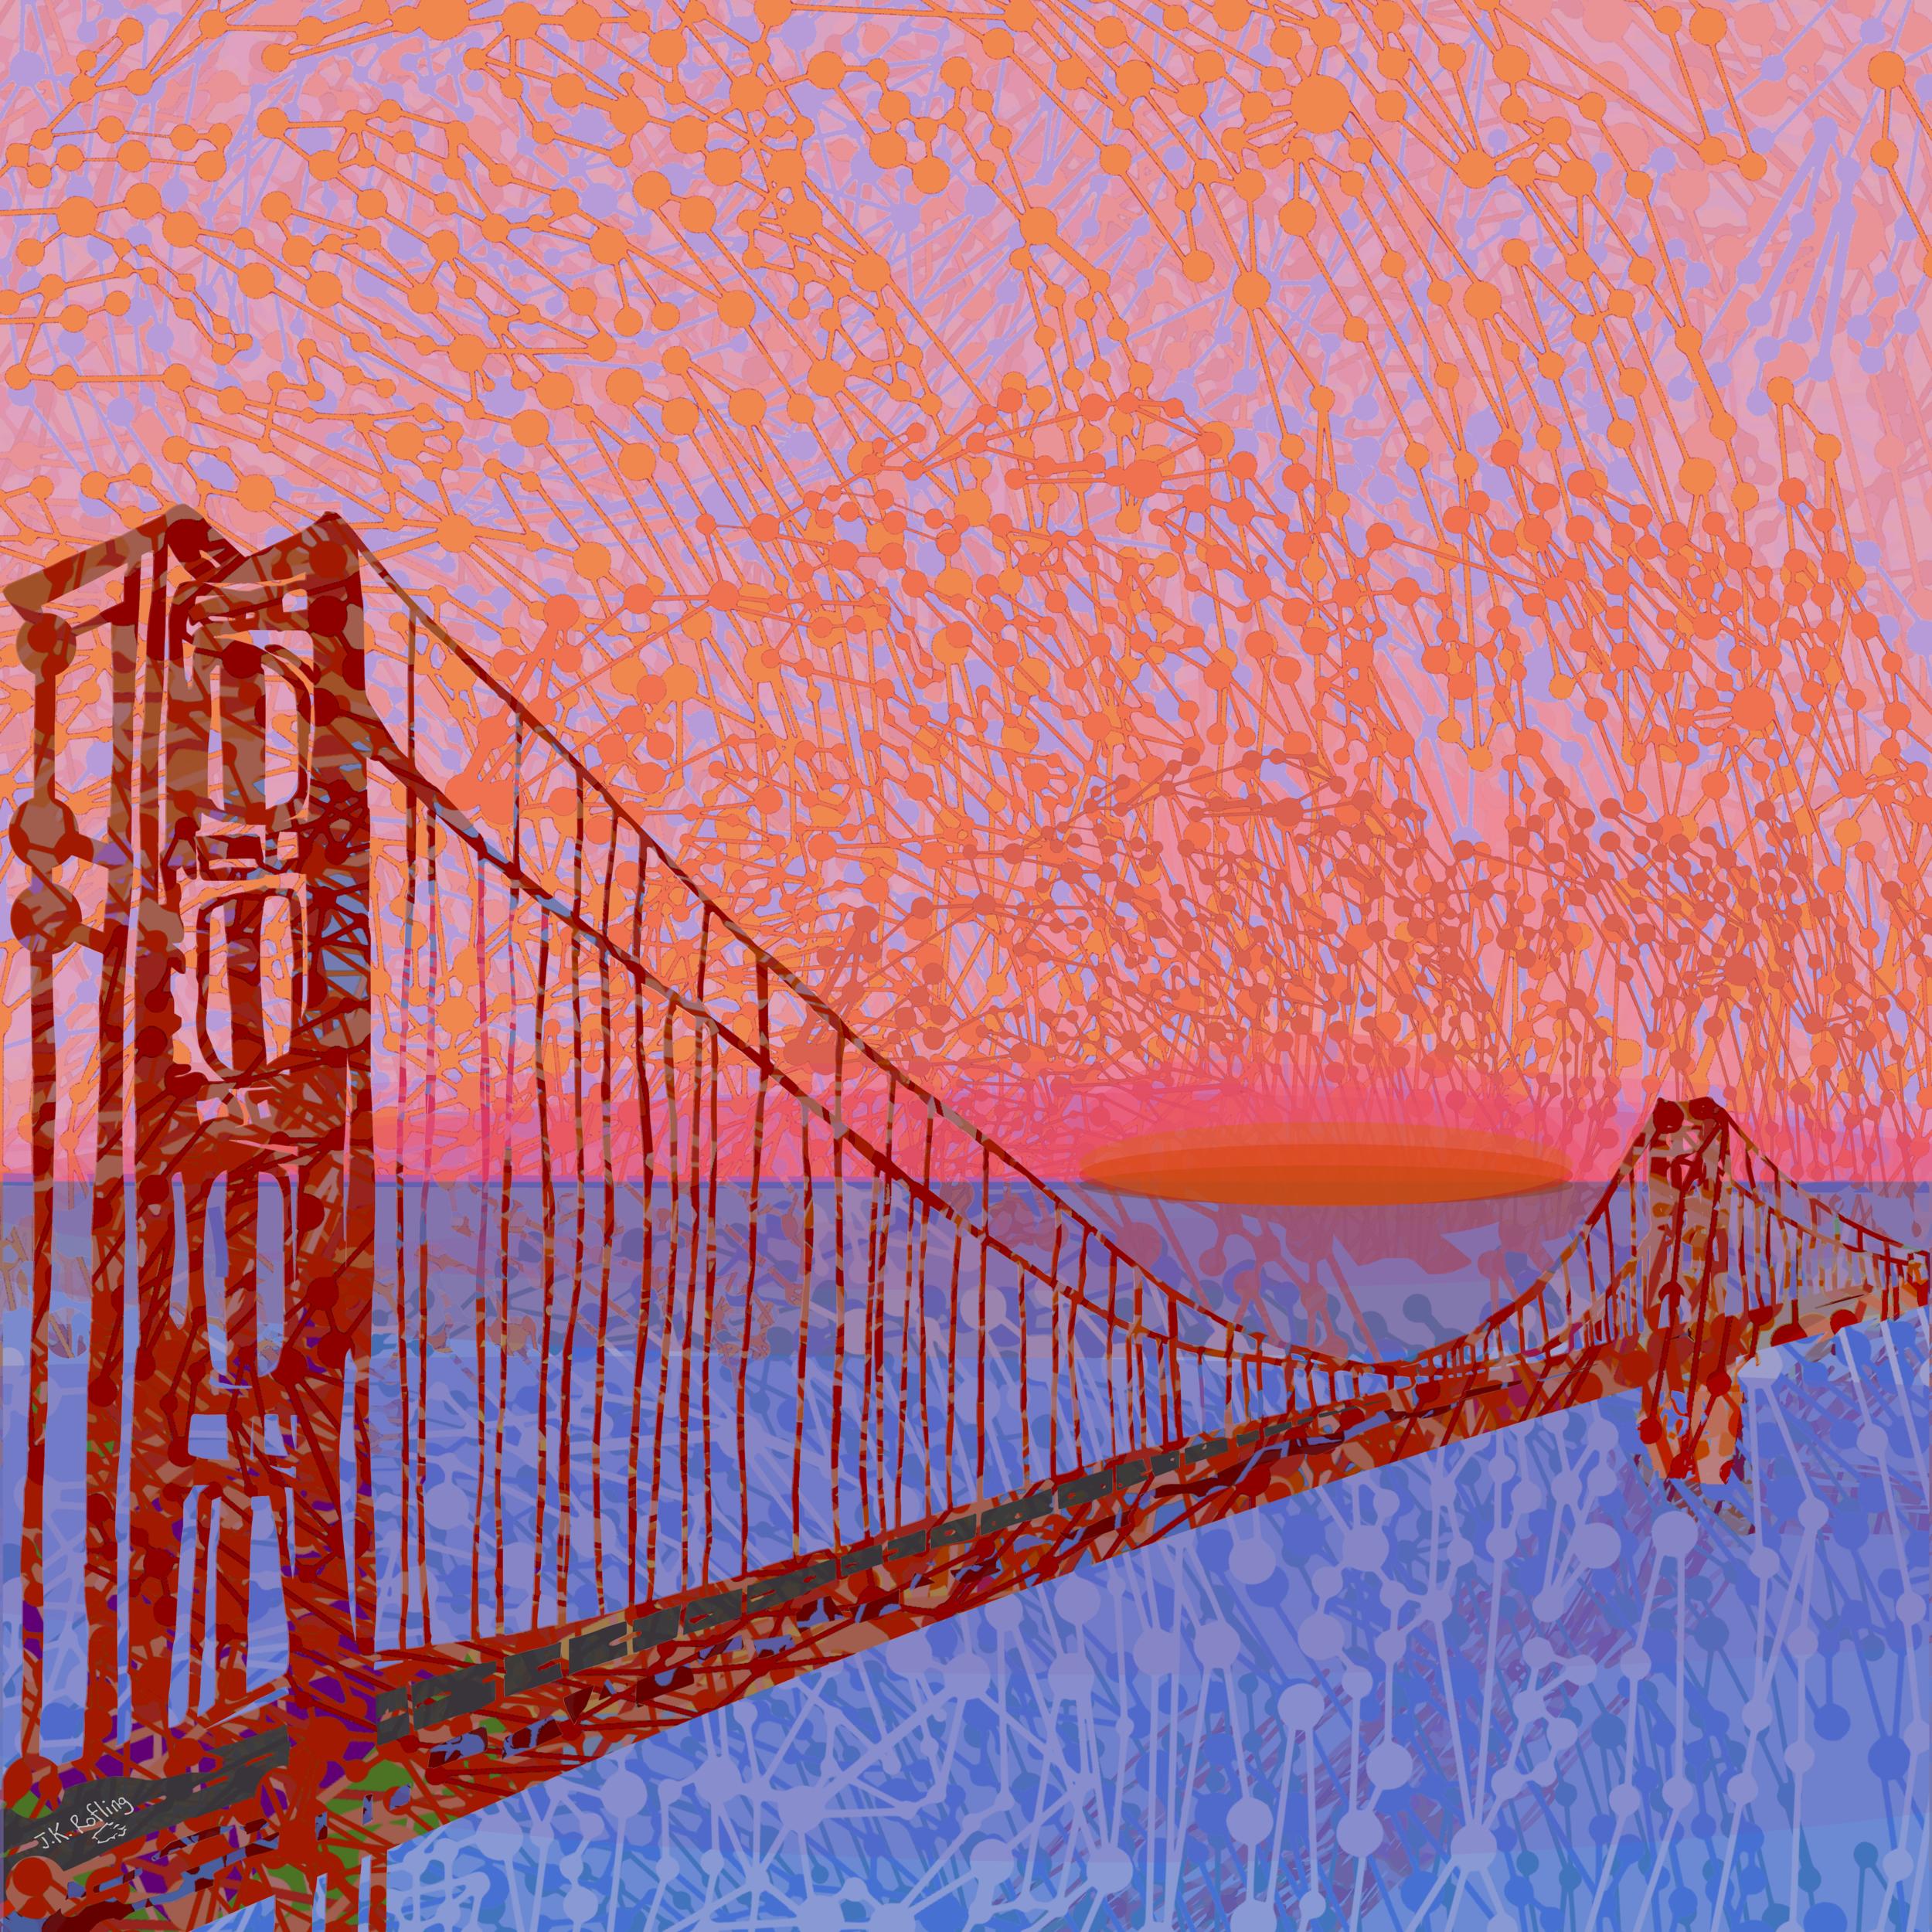 the Bridge01.png